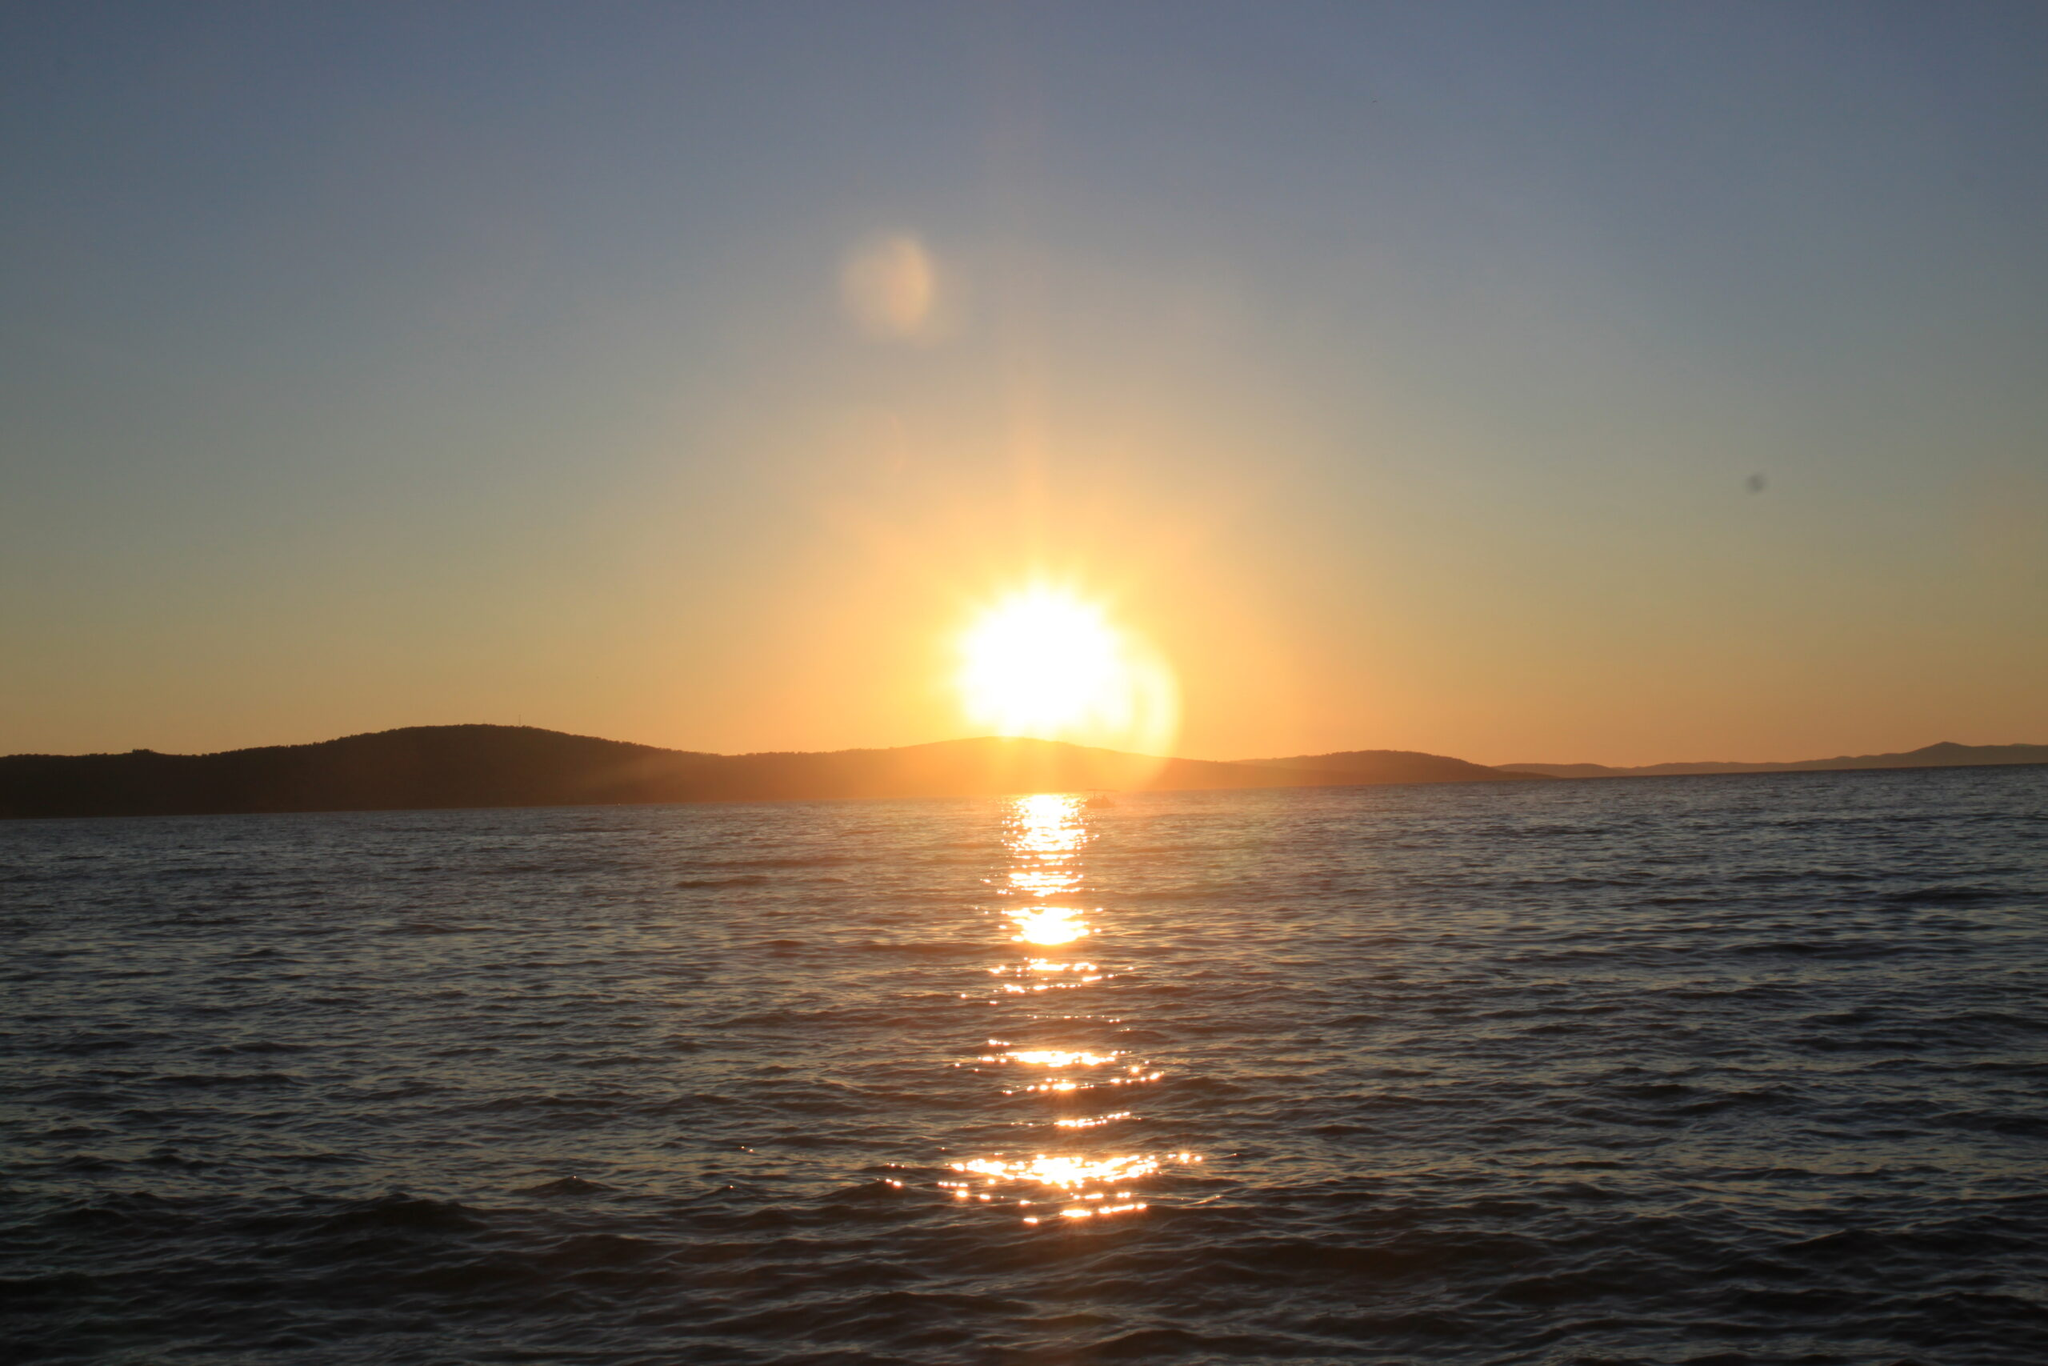 Sonnenuntergang an Bord der Yacht.